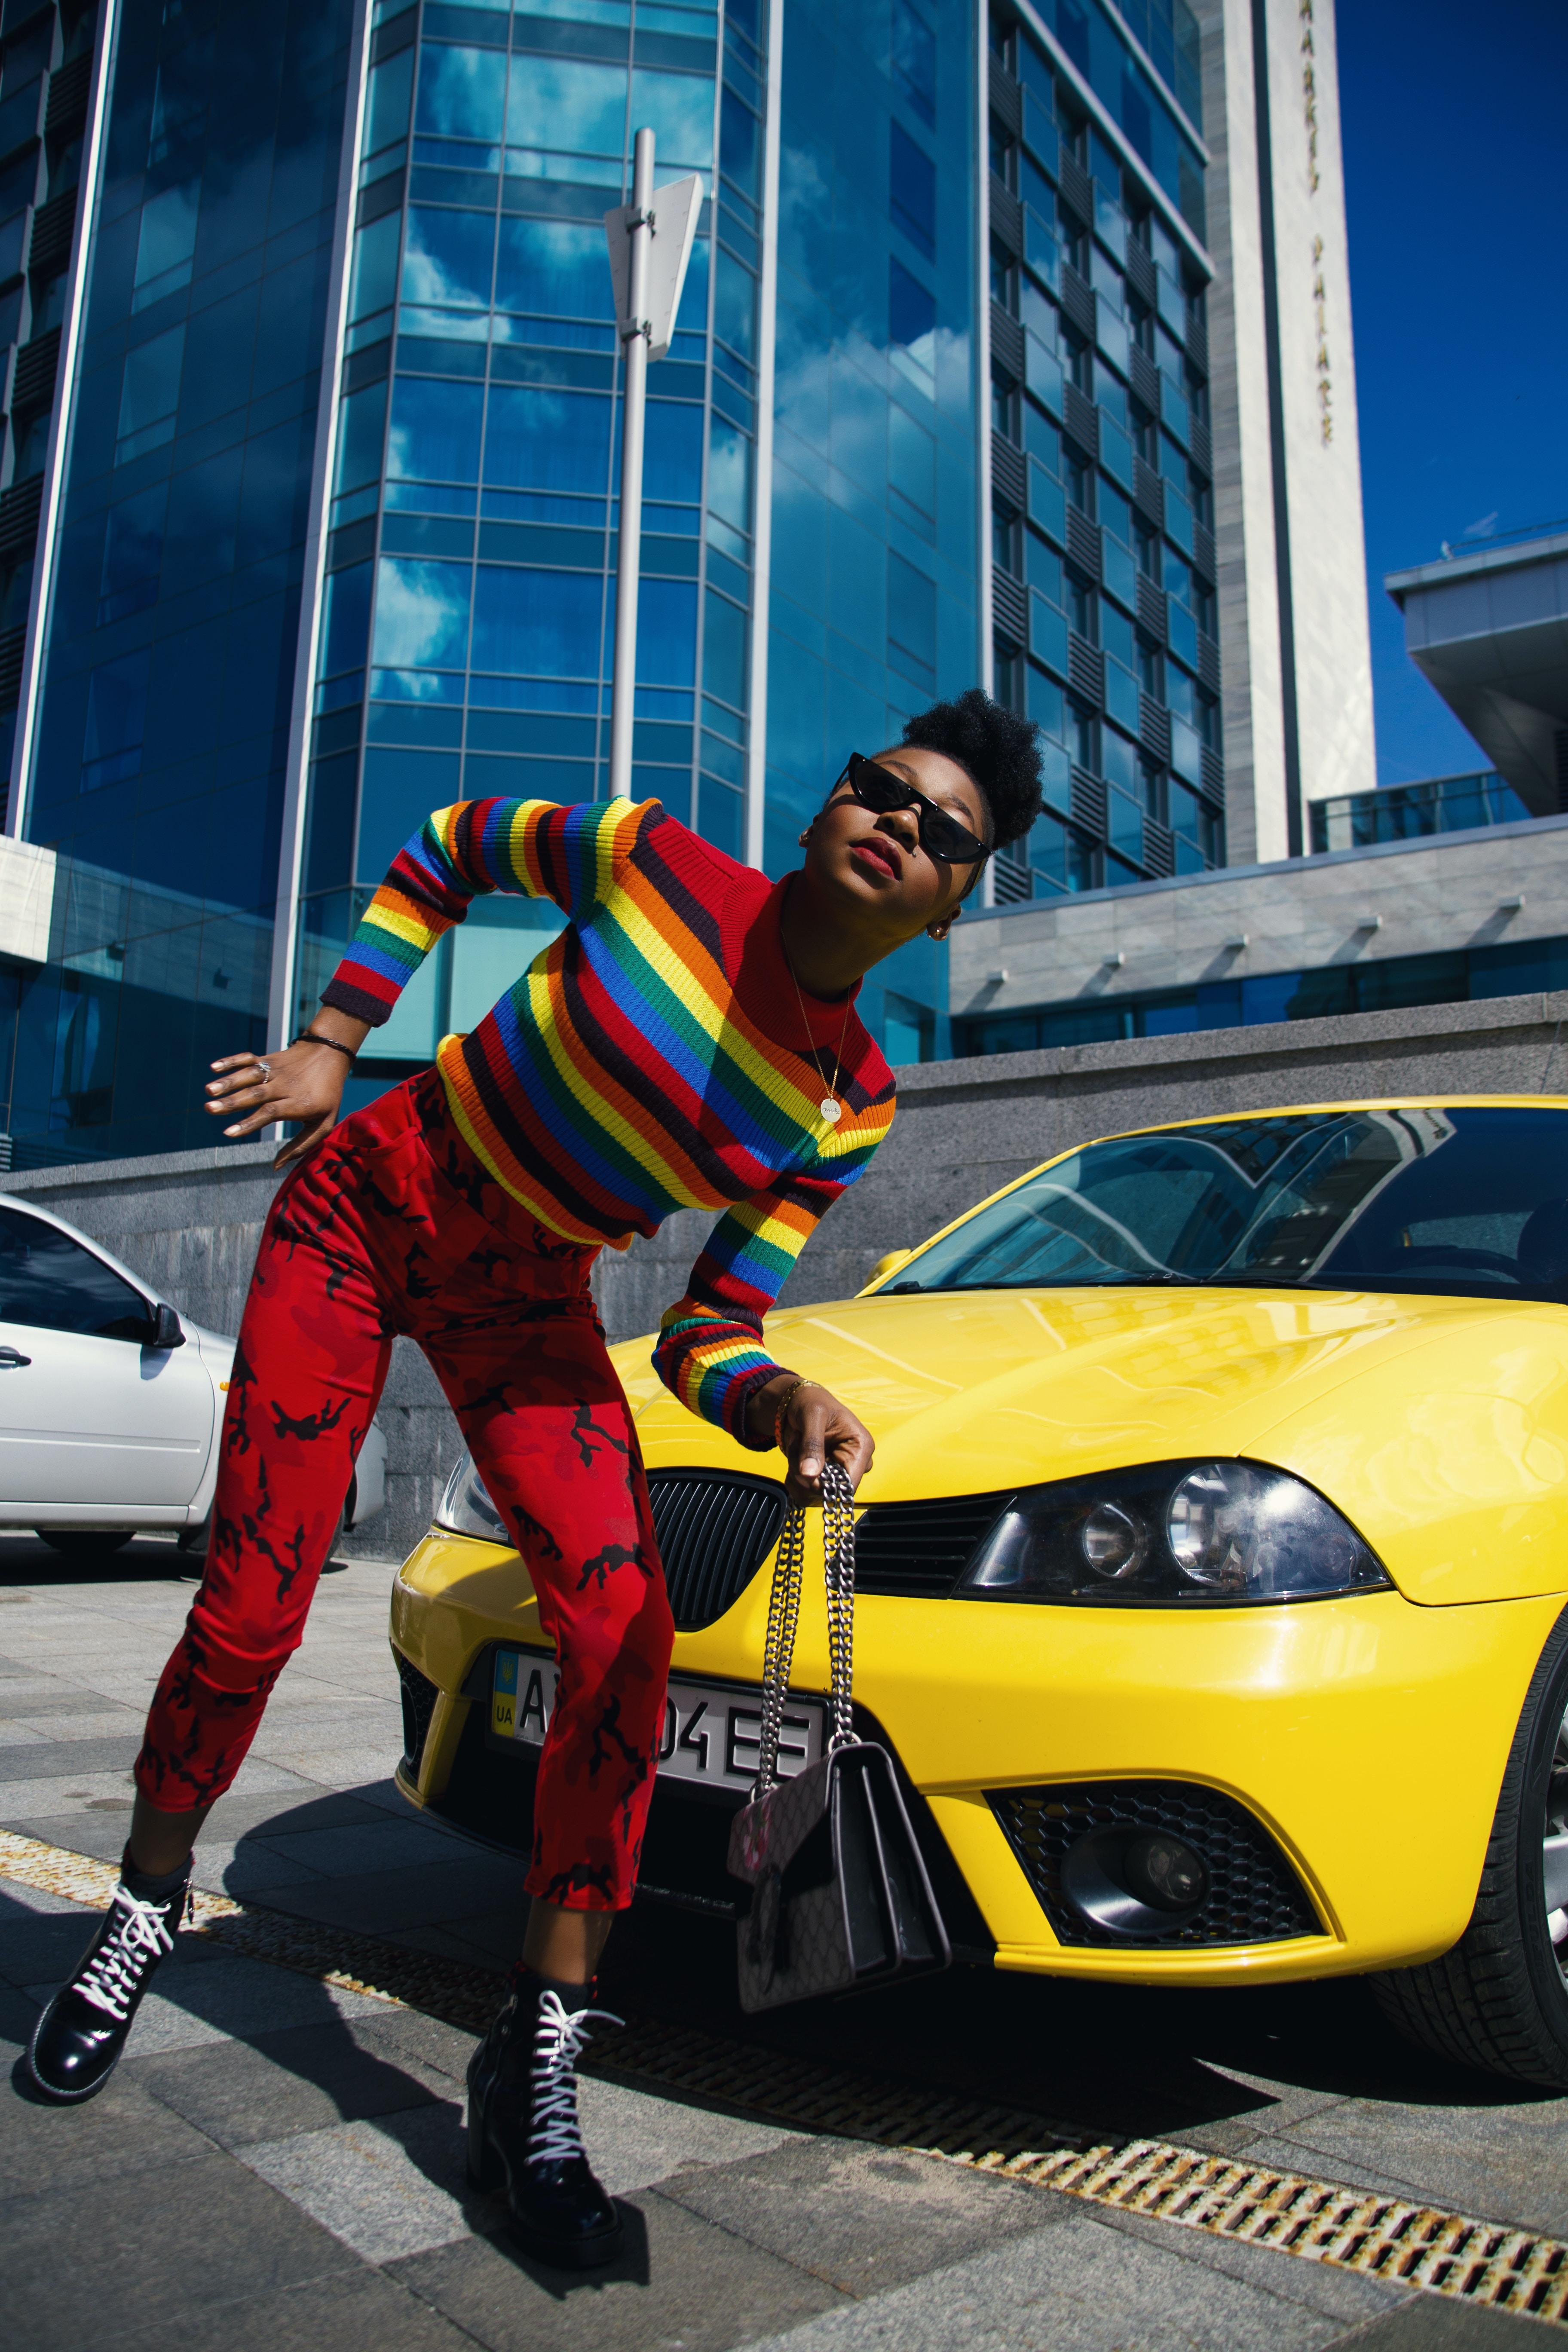 woman beside yellow car during daytime